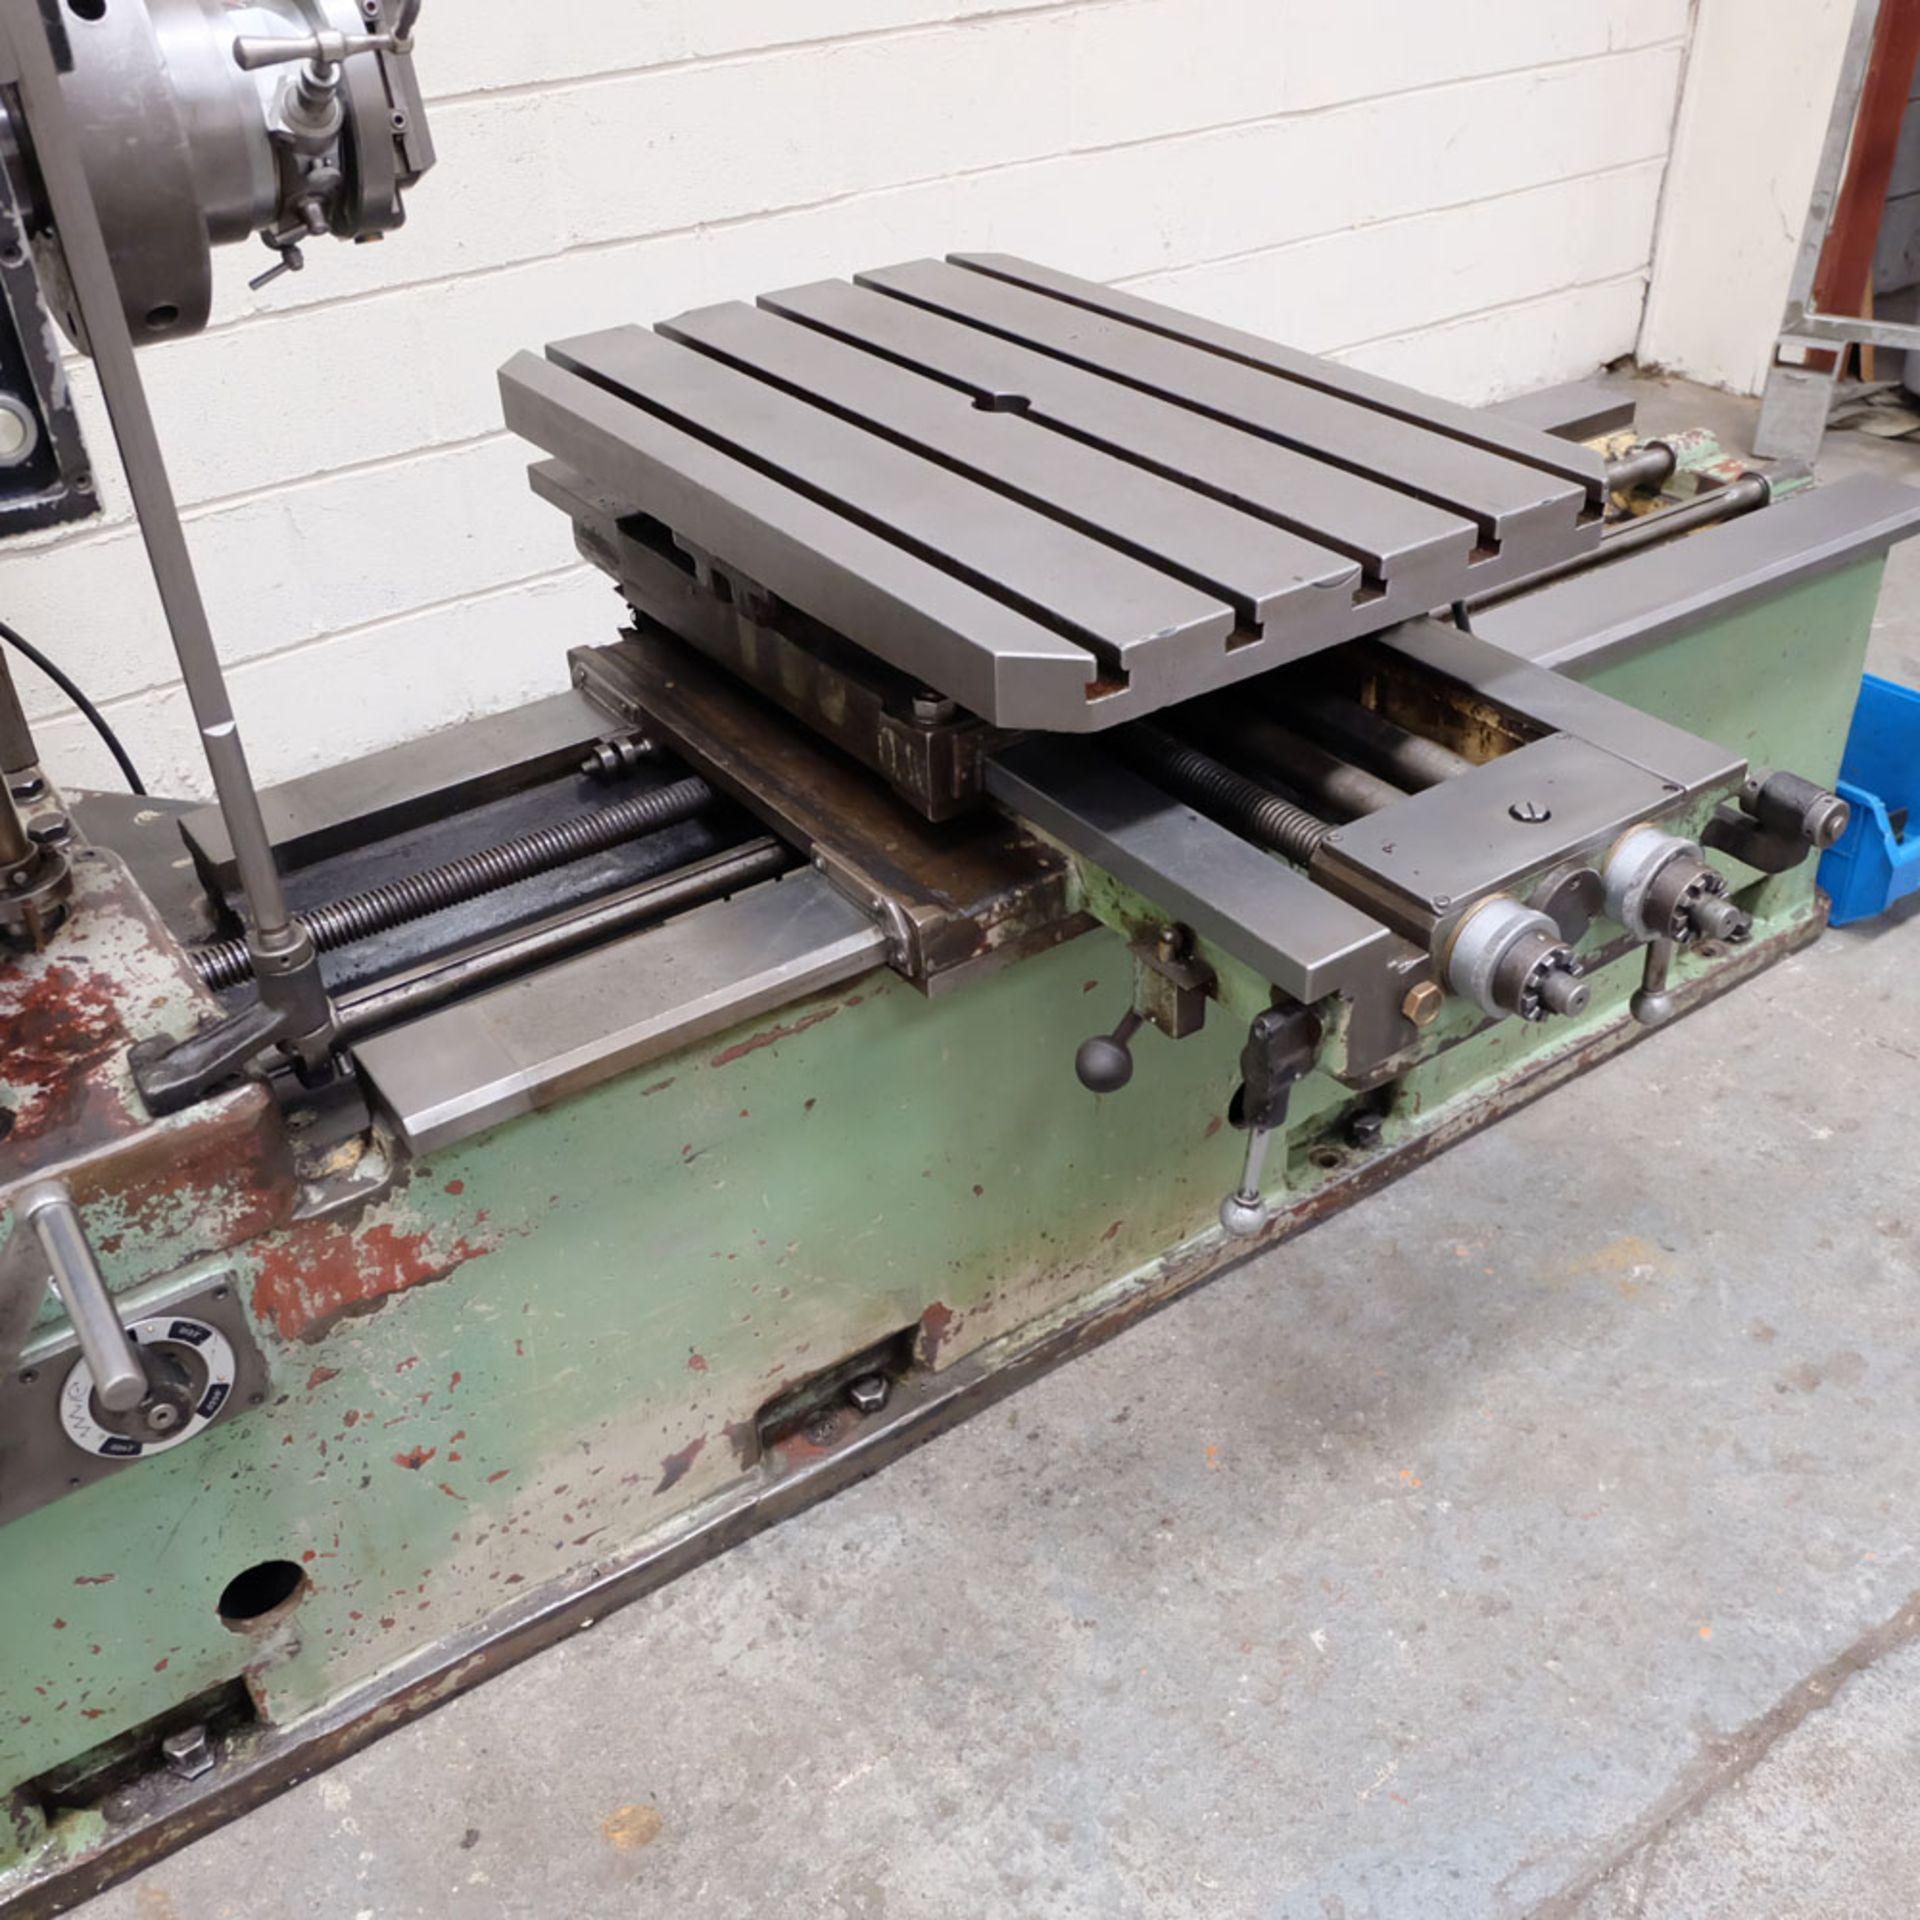 Juaristi Model MDR-55 Horizontal Boring Machine. Spindle Size: 55mm Dia. Spindle Bore: No.4 MT. - Image 6 of 14